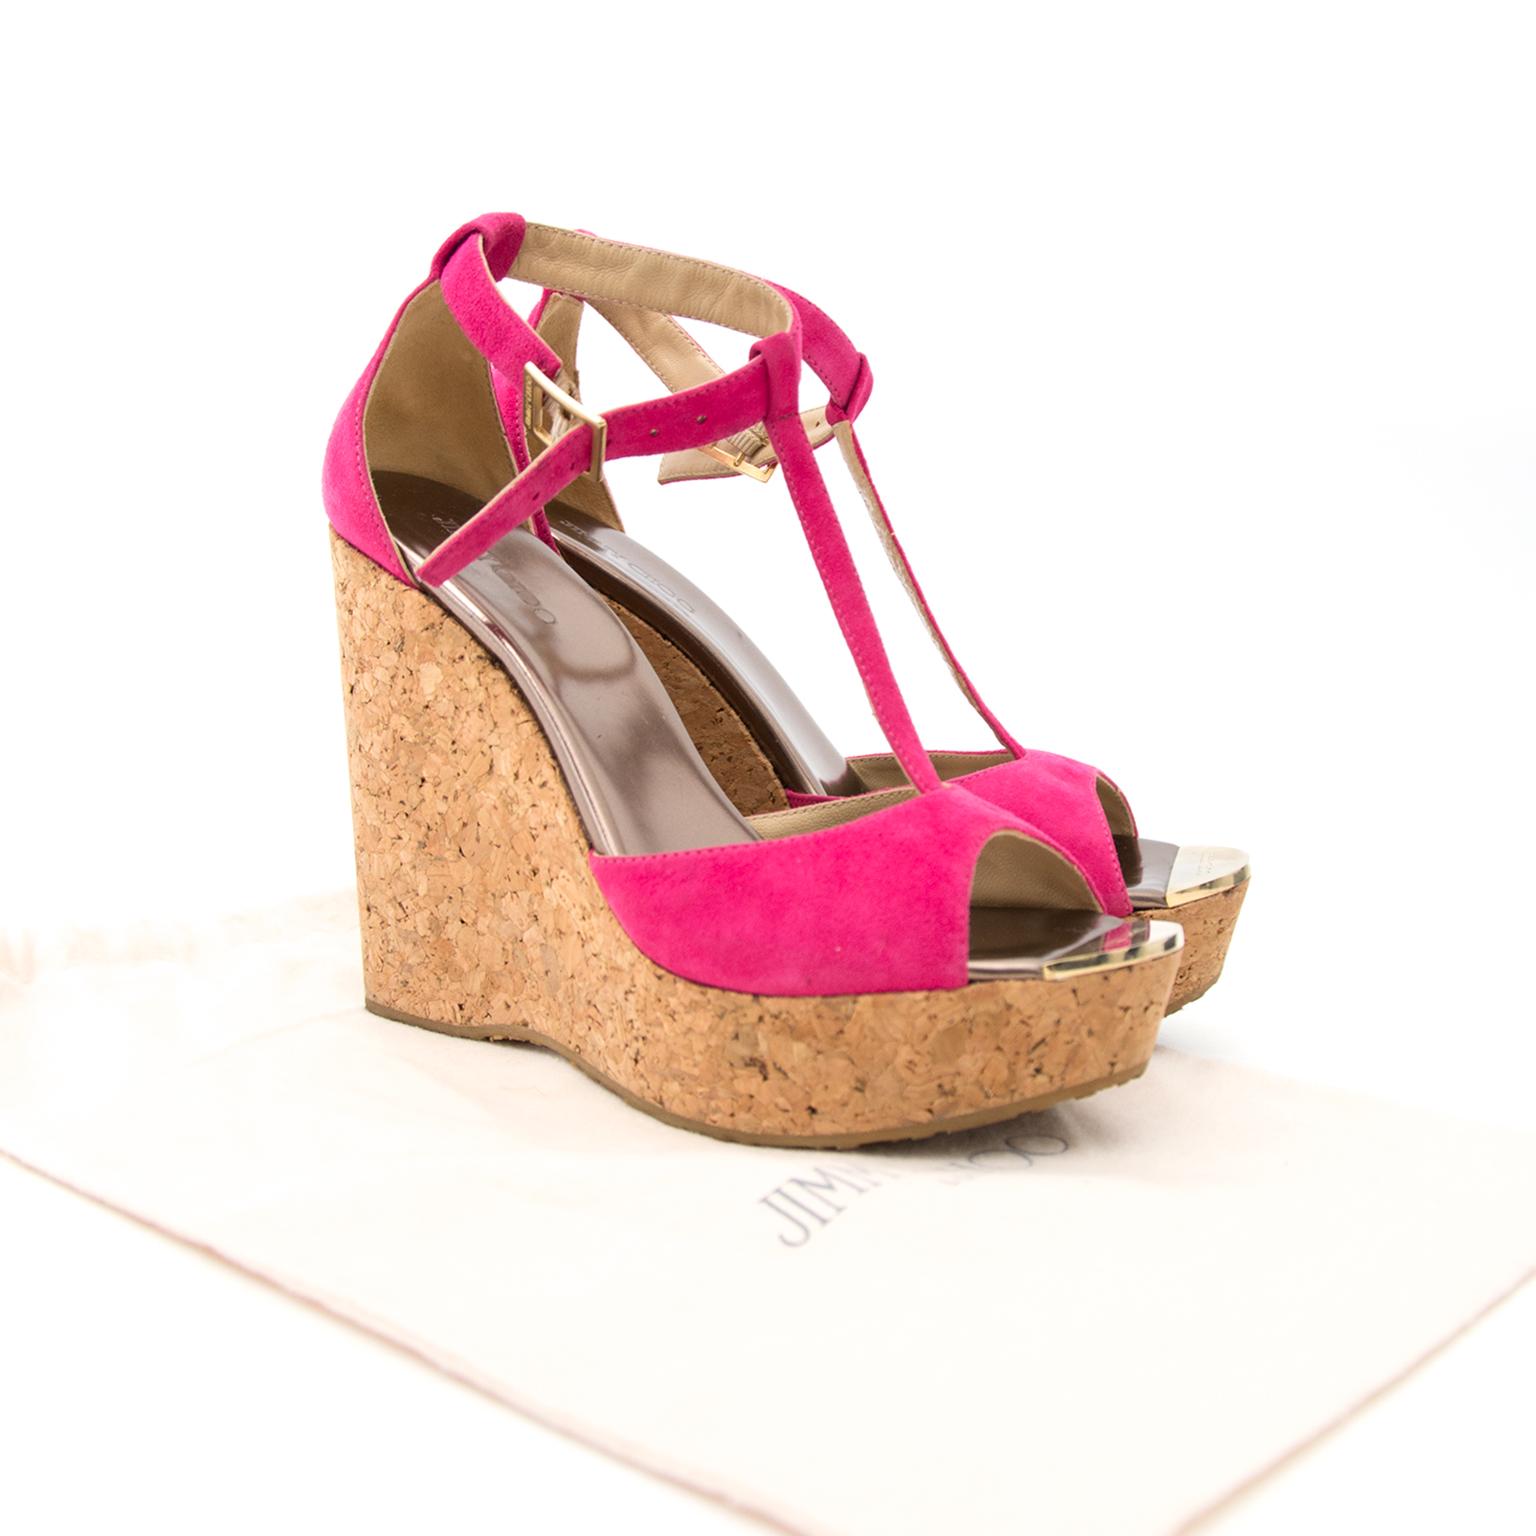 Shop luxury items in Antwerp like Jimmy Choo Pink Cork Wedges - Size: 39,5